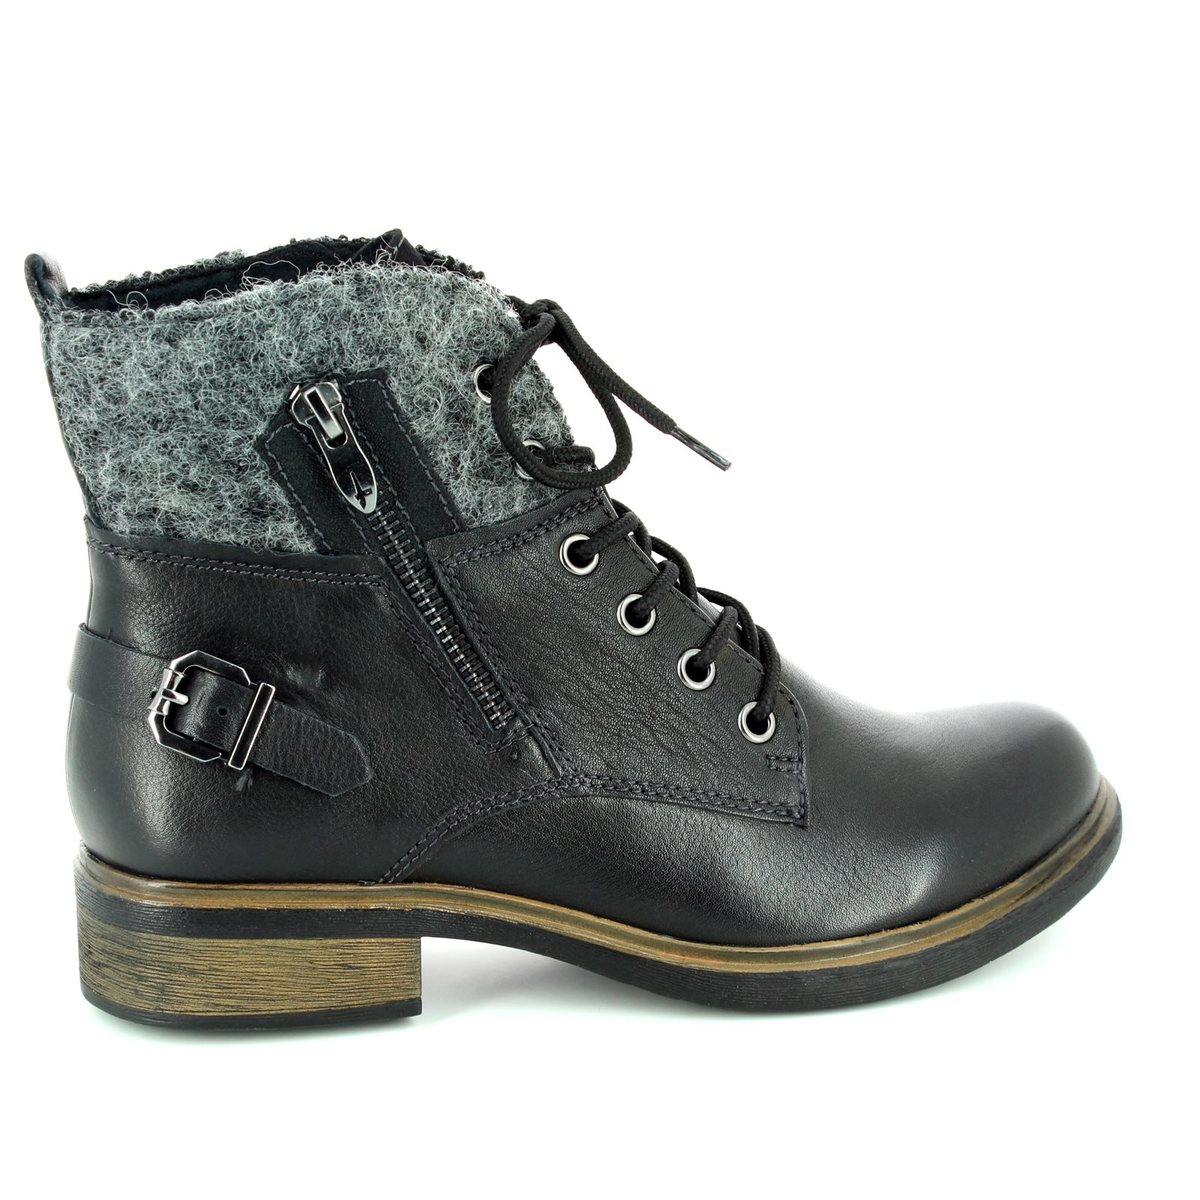 tamaris helios 25110 001 black ankle boots. Black Bedroom Furniture Sets. Home Design Ideas